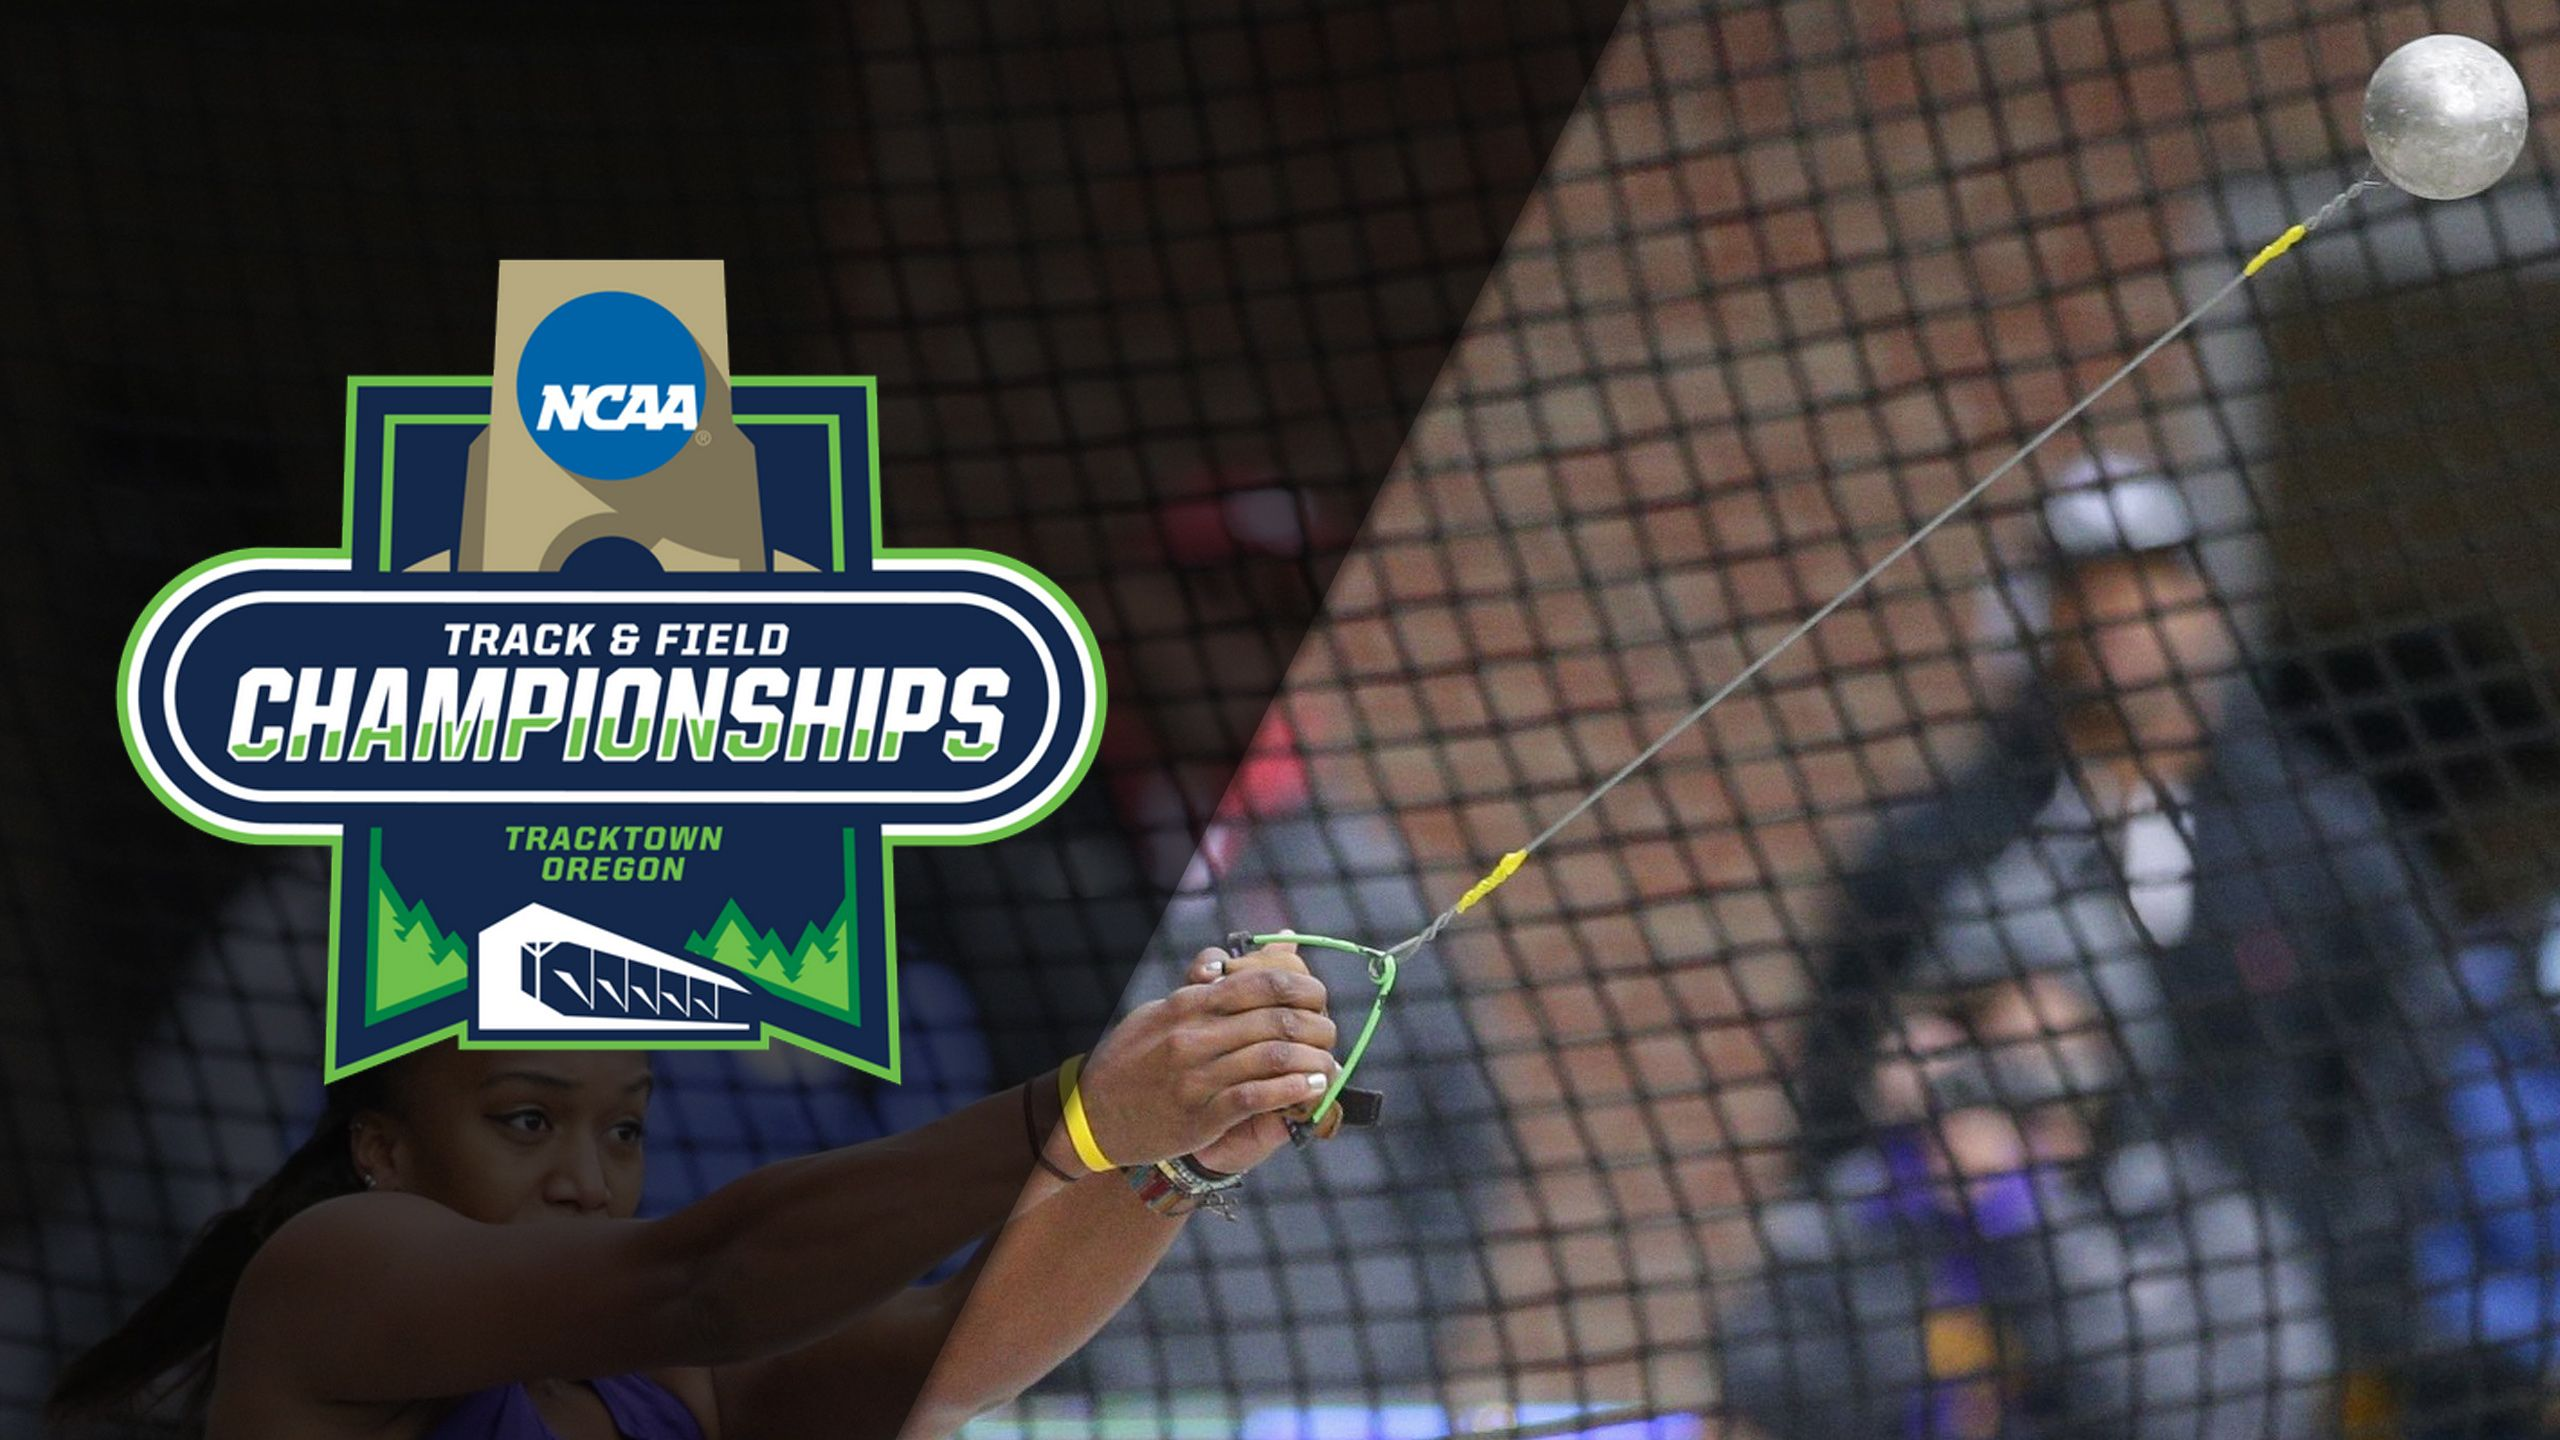 NCAA Track & Field Outdoor Championships - Women's Hammer Throw Final